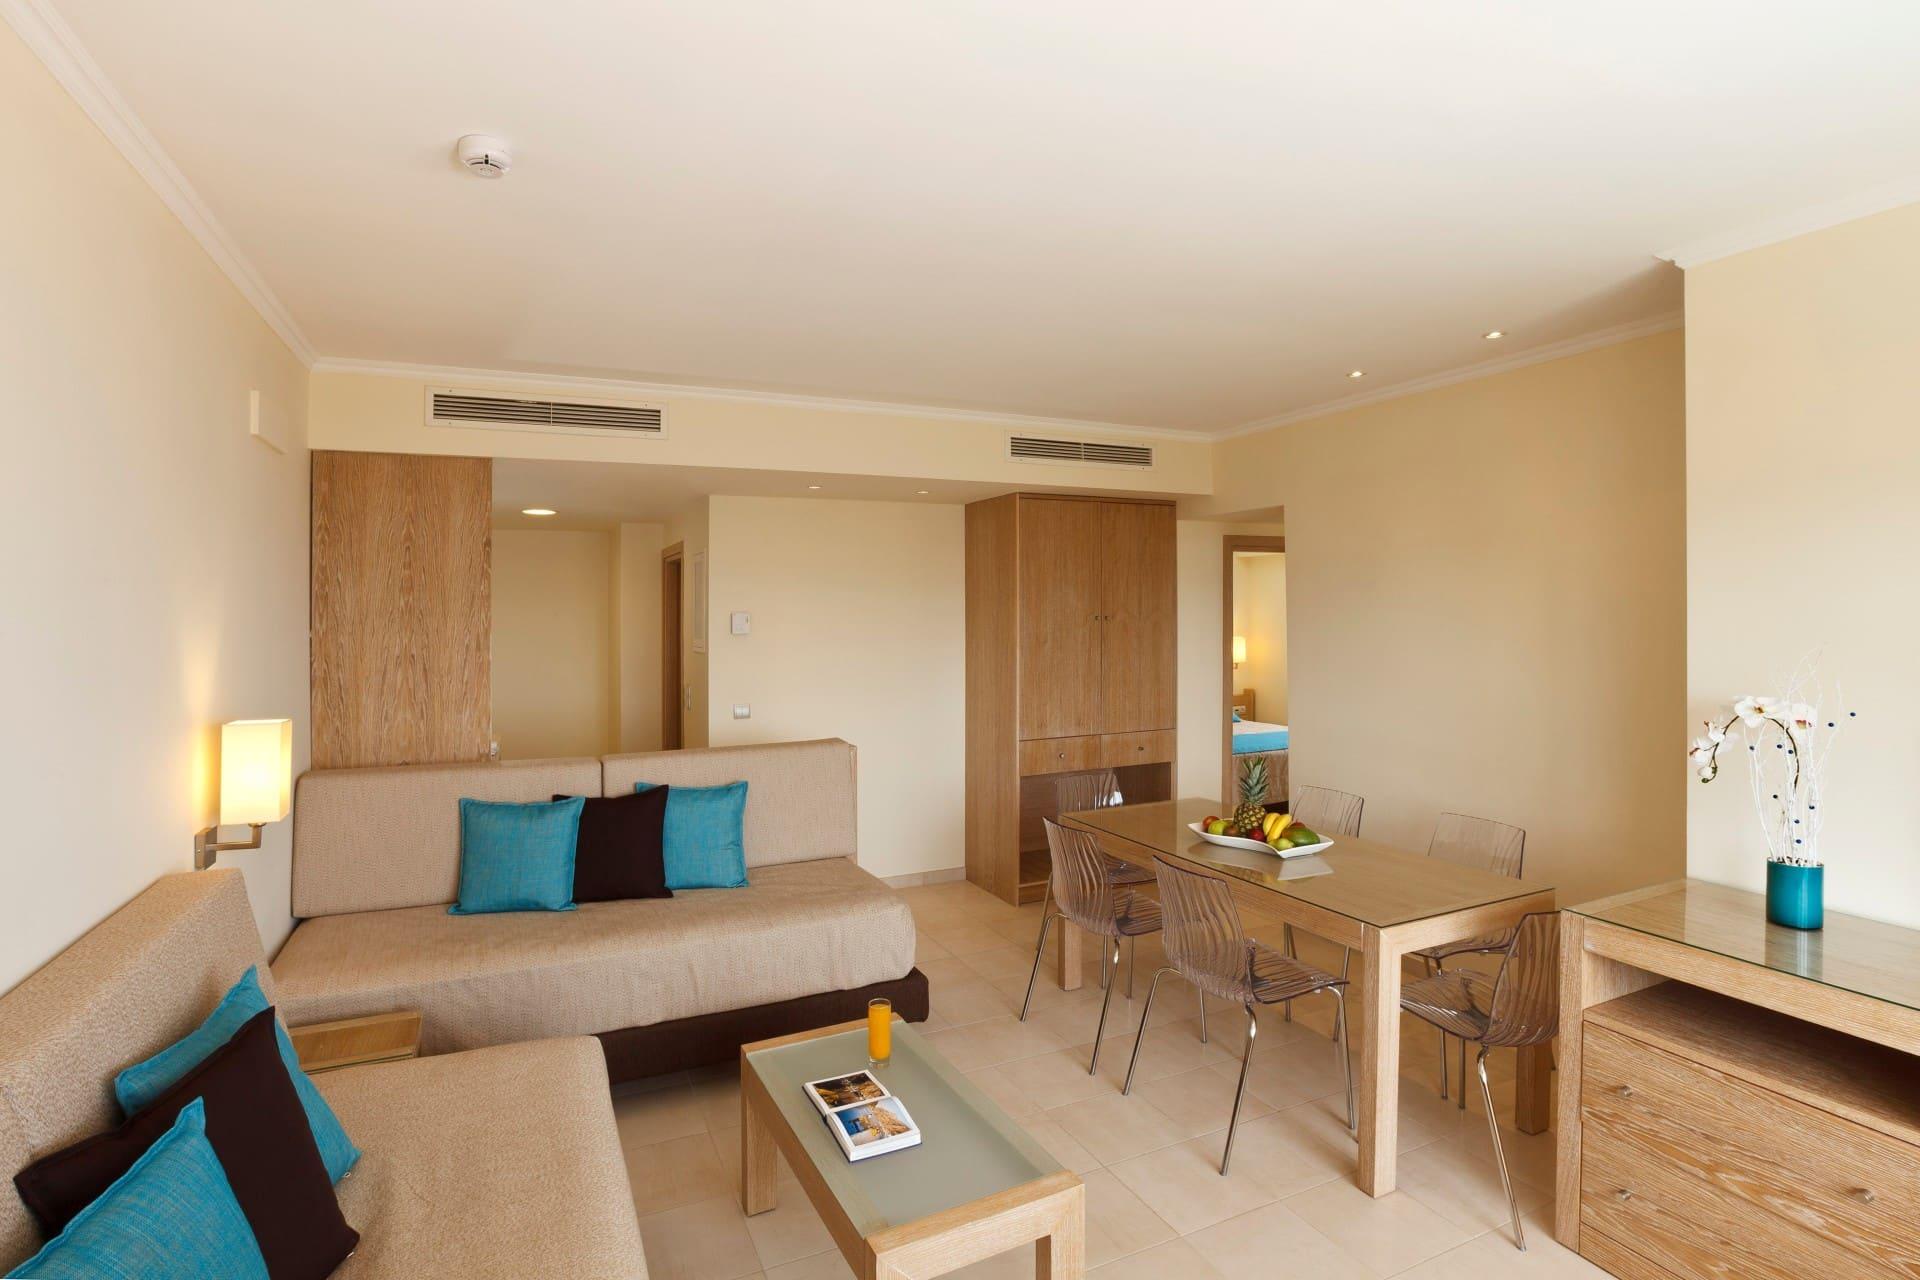 Deluxe_Aegean_GV_Living_room2